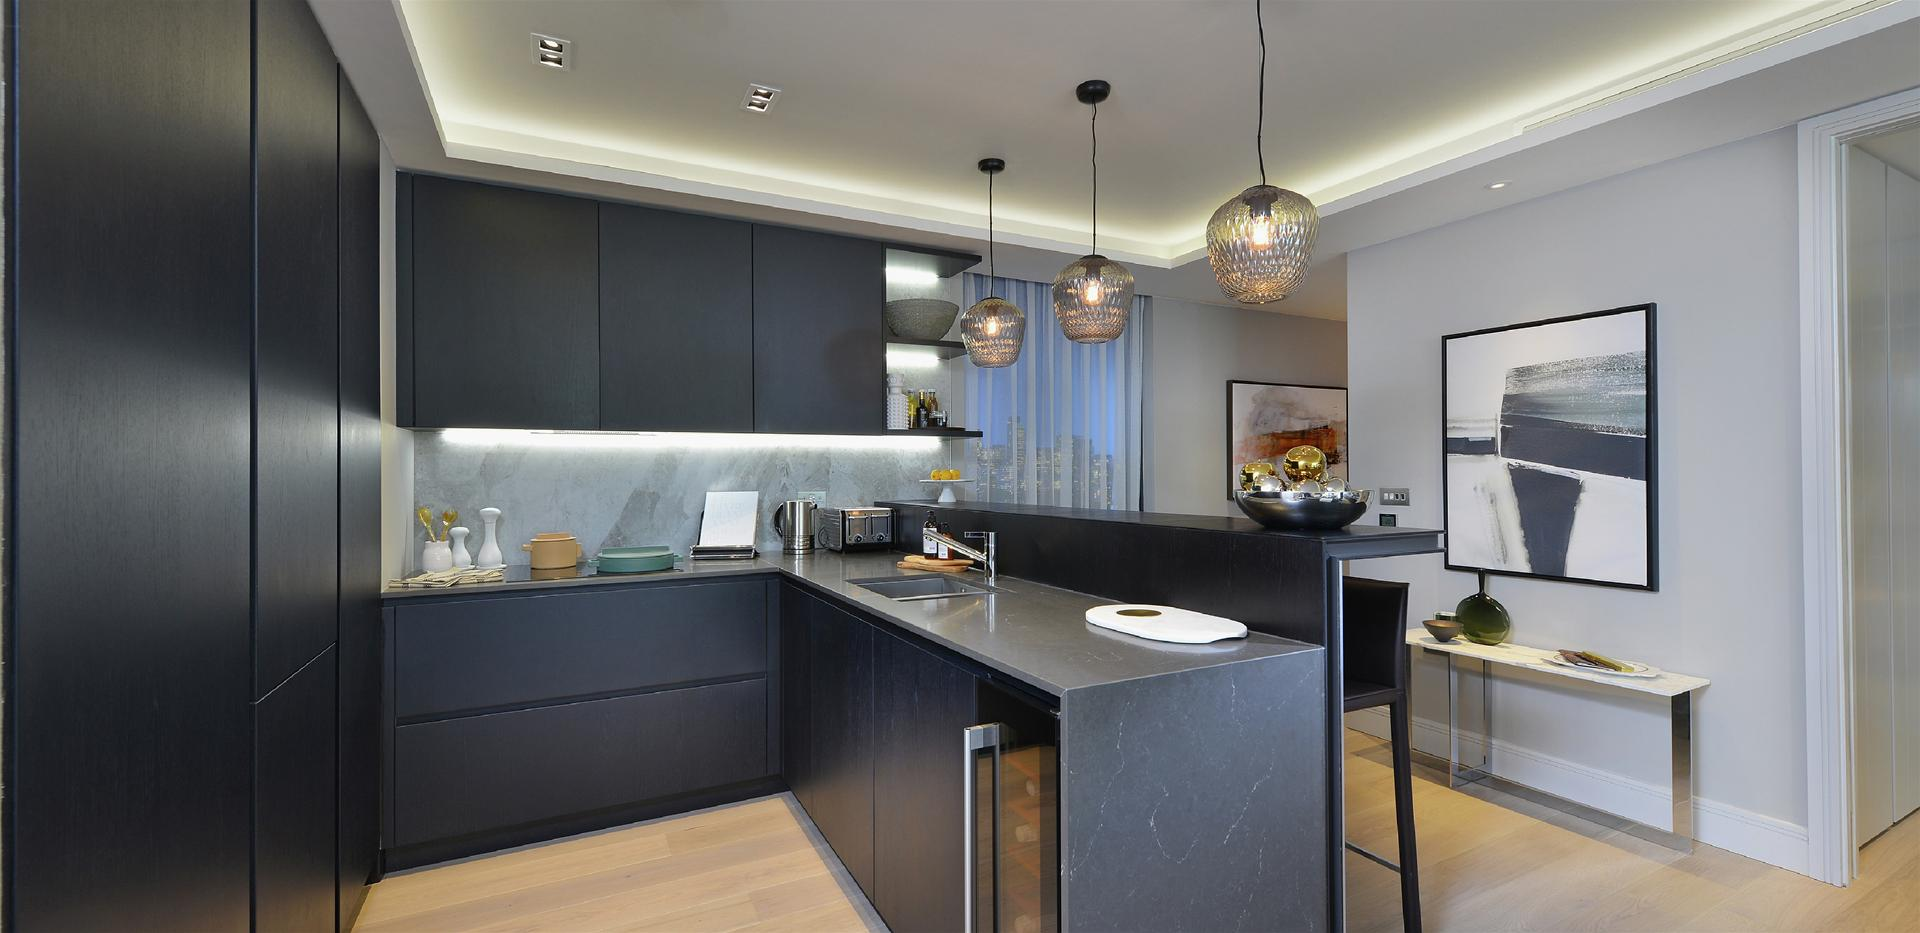 Berkeley, 250 City Road, Islington, Show Apartment, Kitchen, Interior